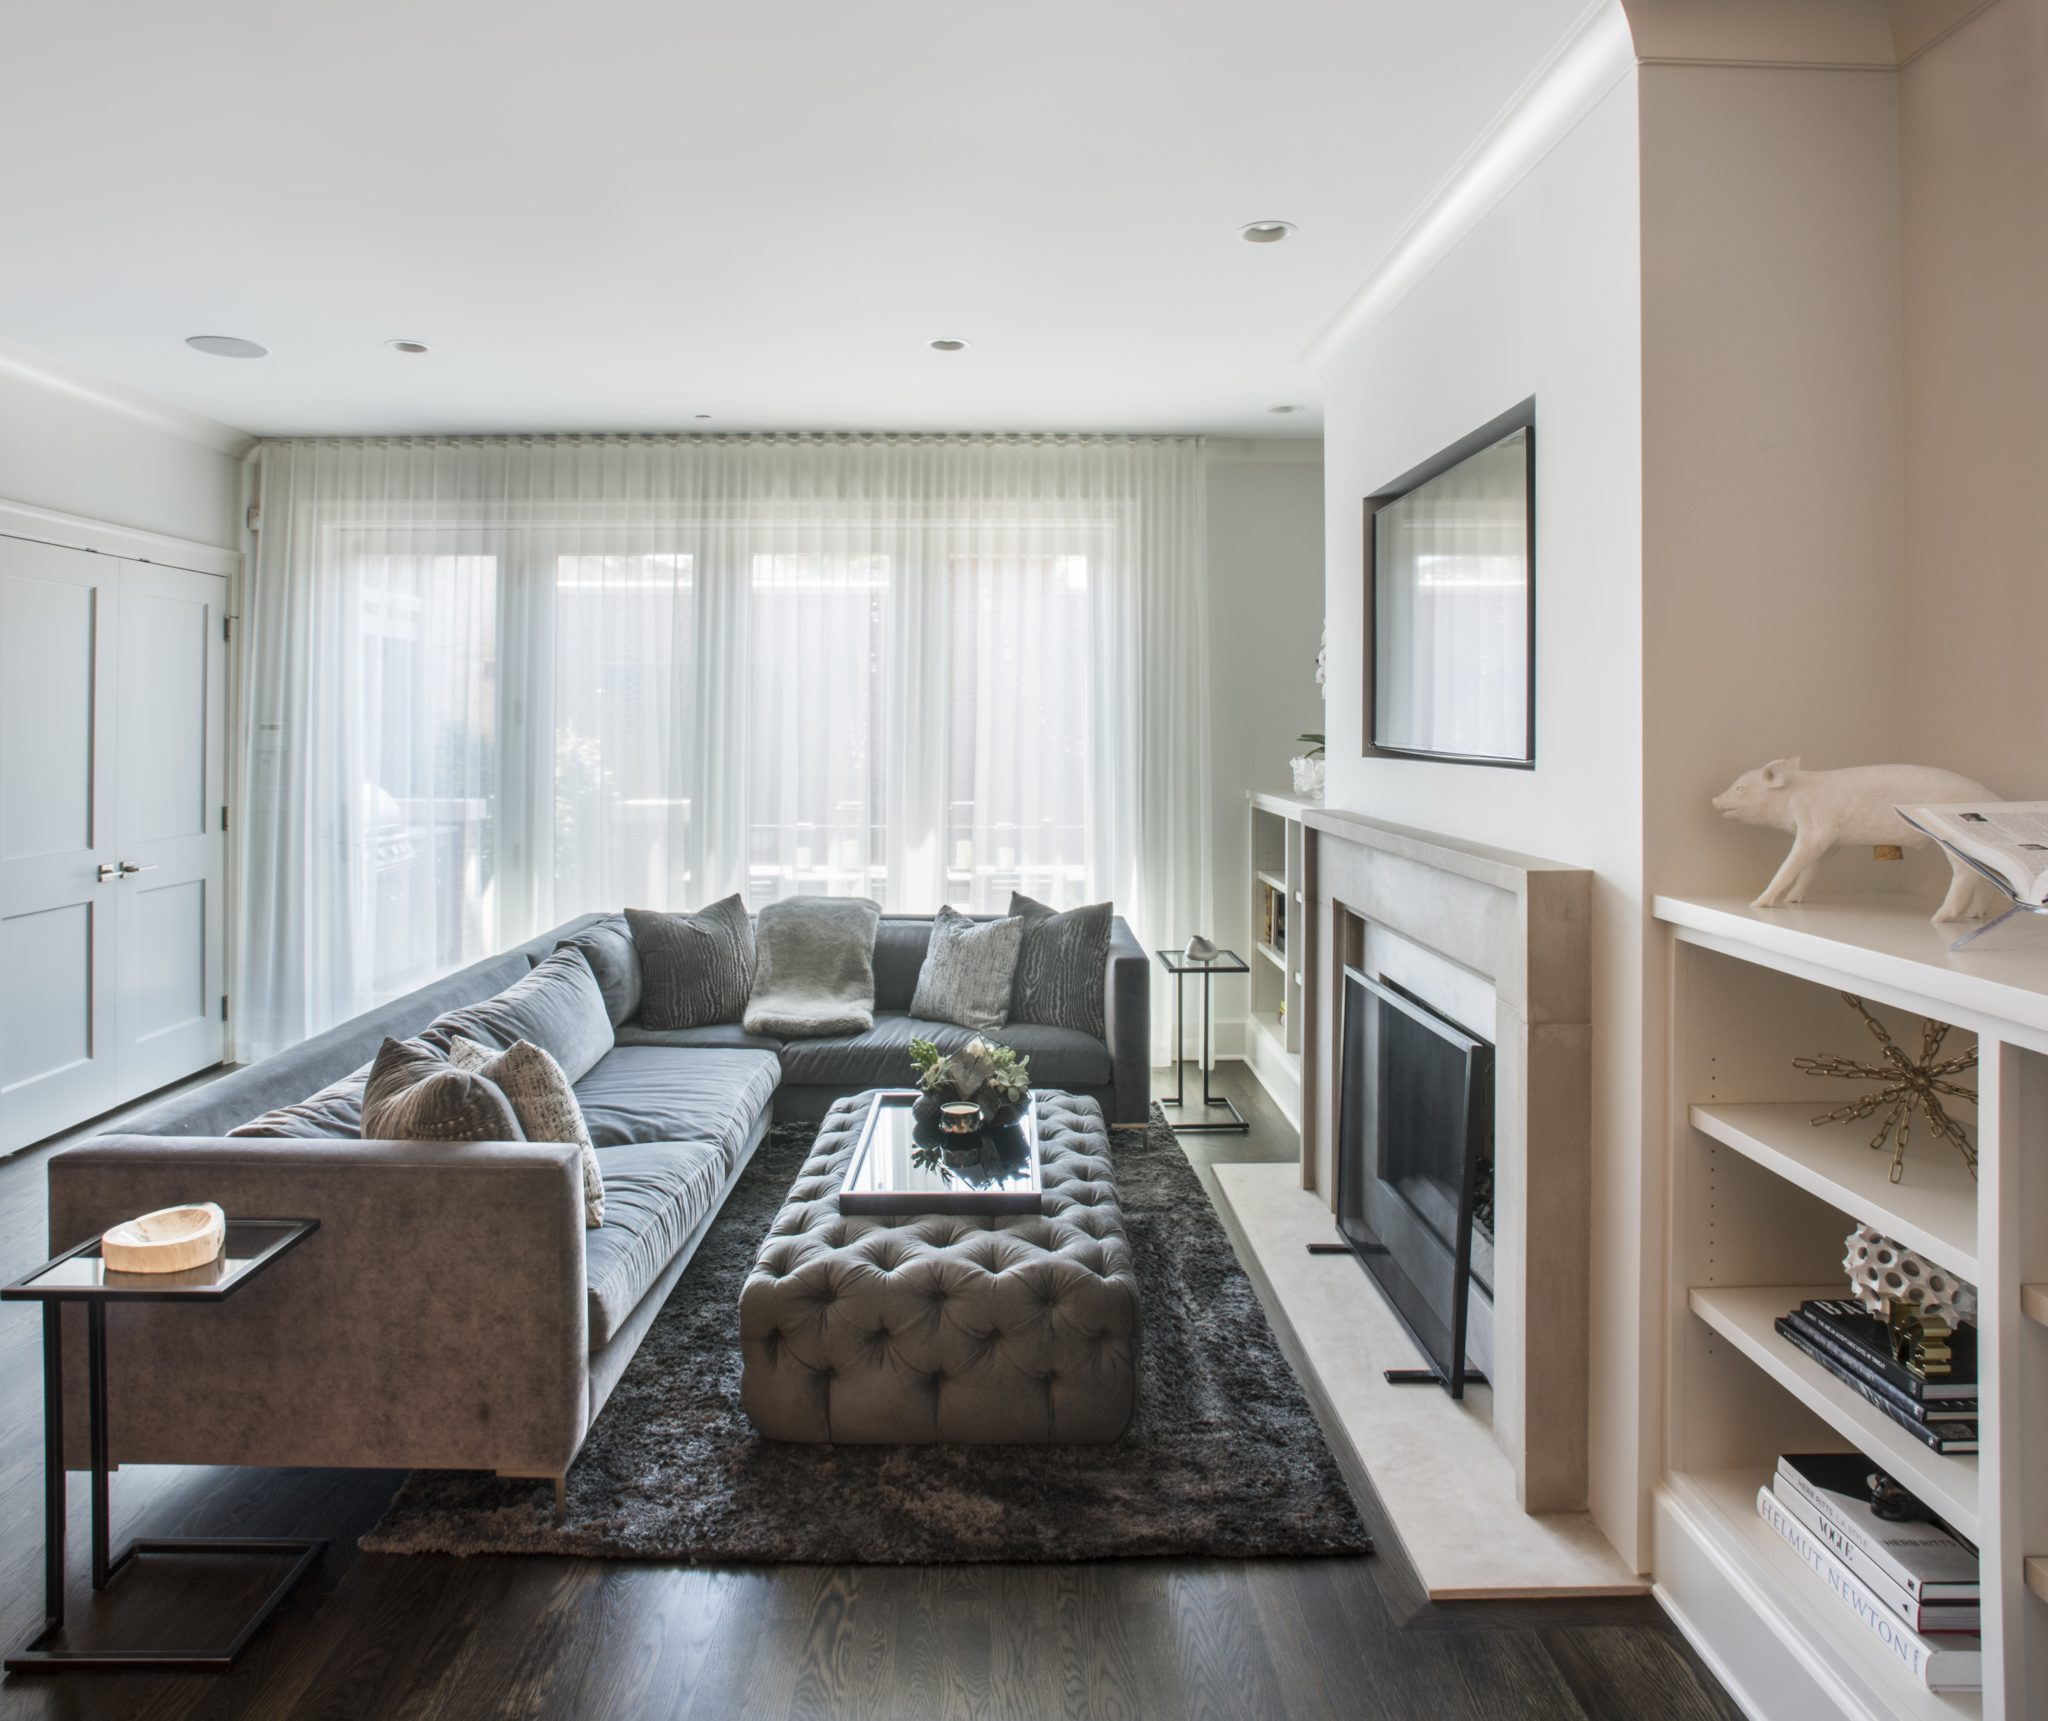 Bucktown Single Family Home by Brianne Bishop Design